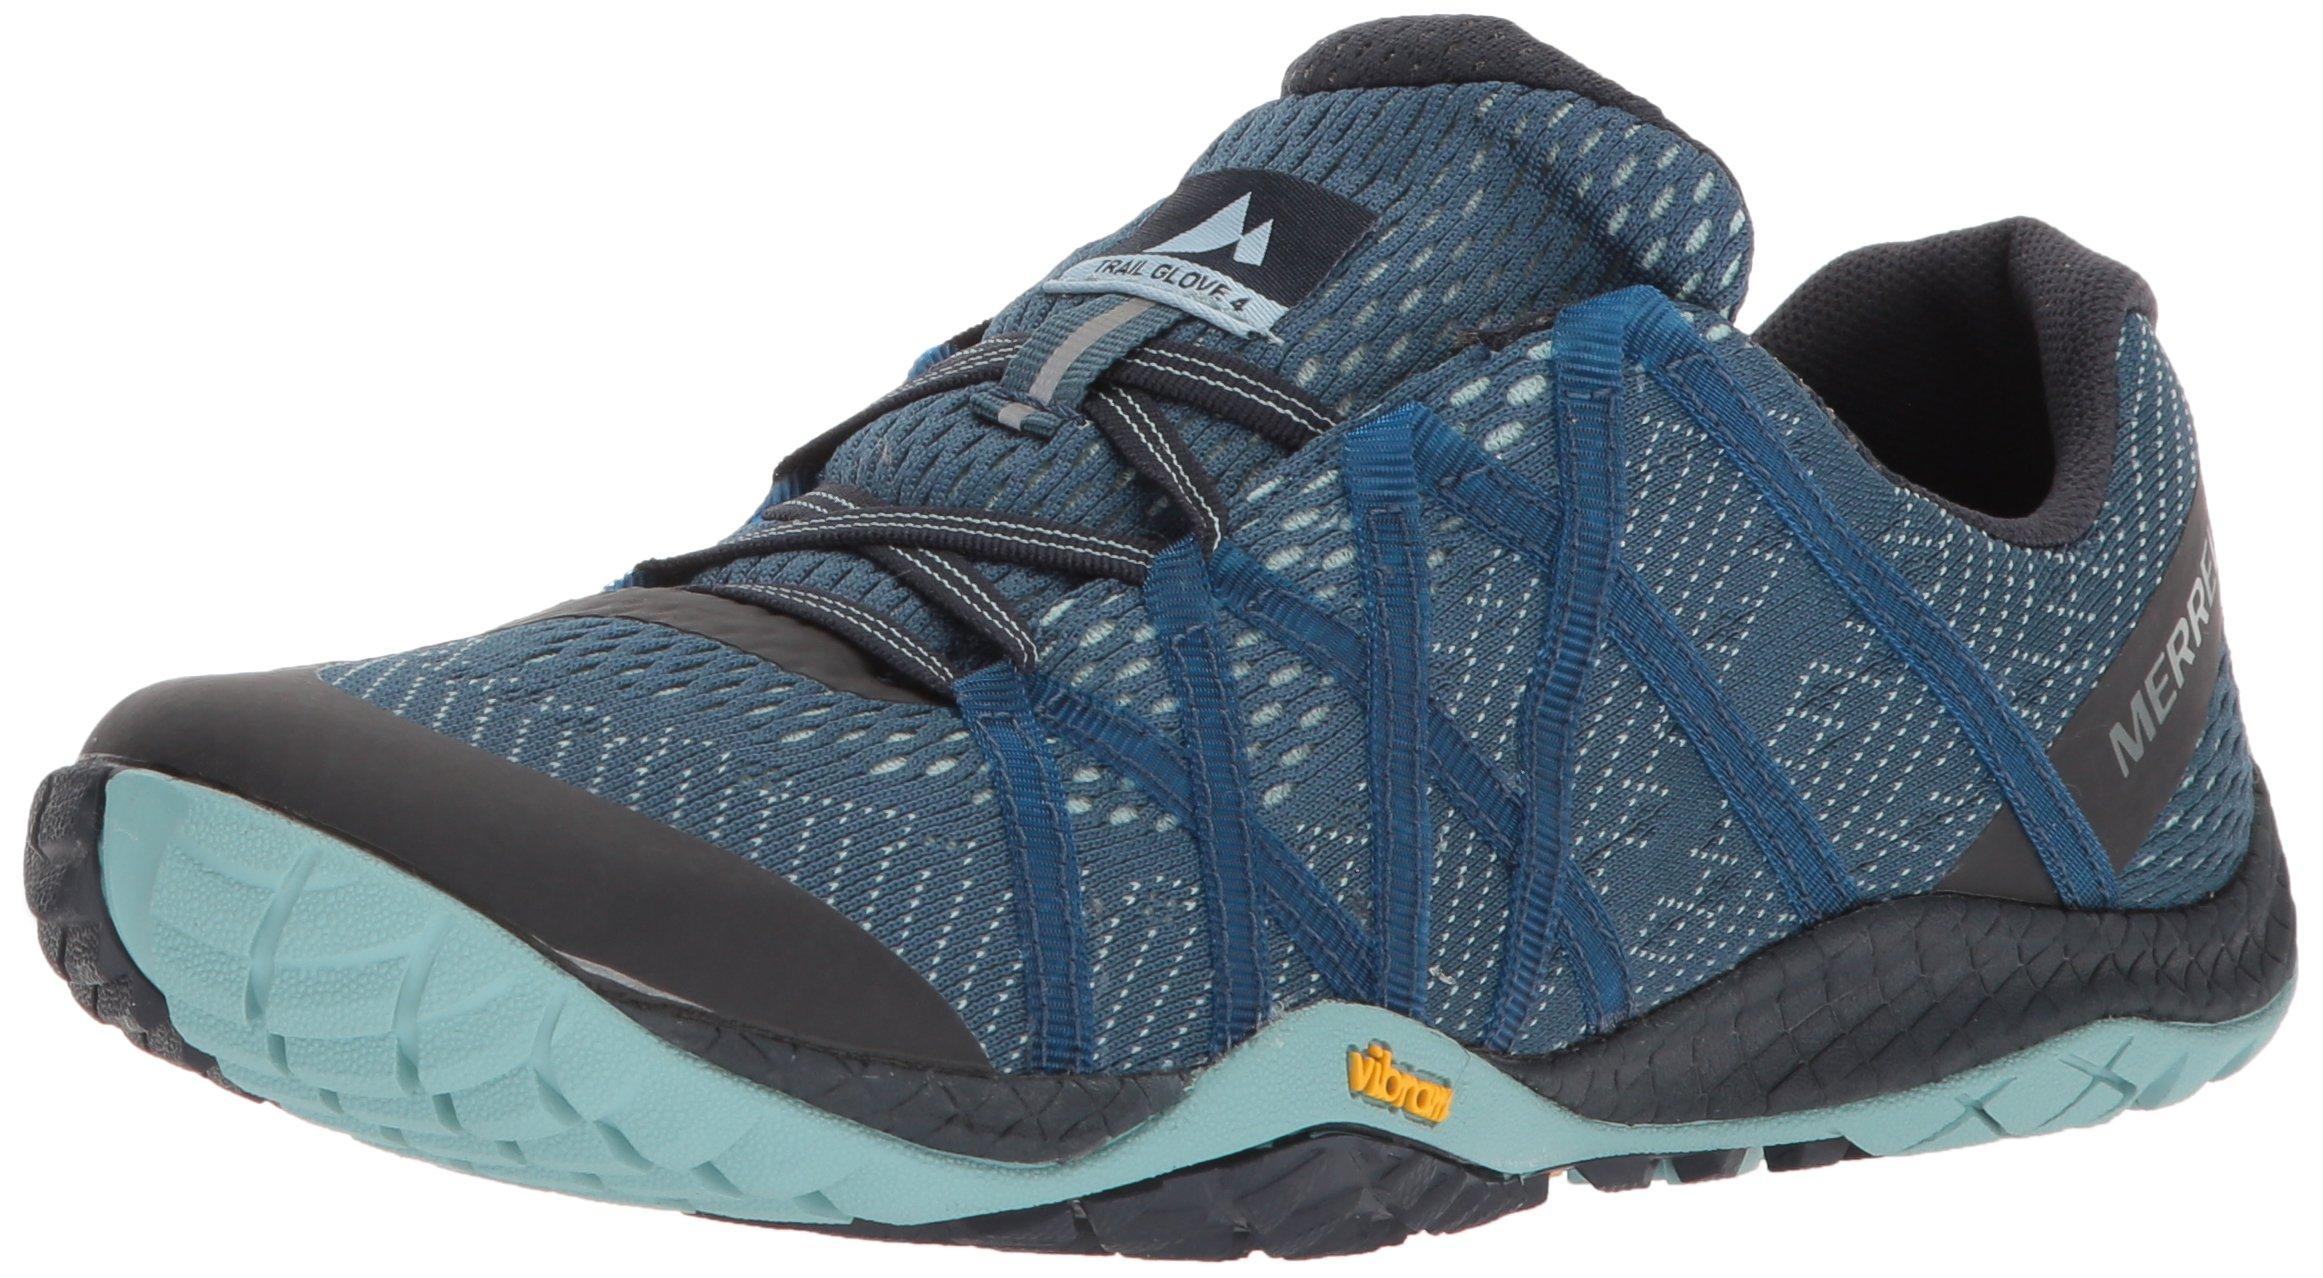 Merrell Women's Trail Glove 4 E-Mesh Sneaker, Aqua, 8.5 M US